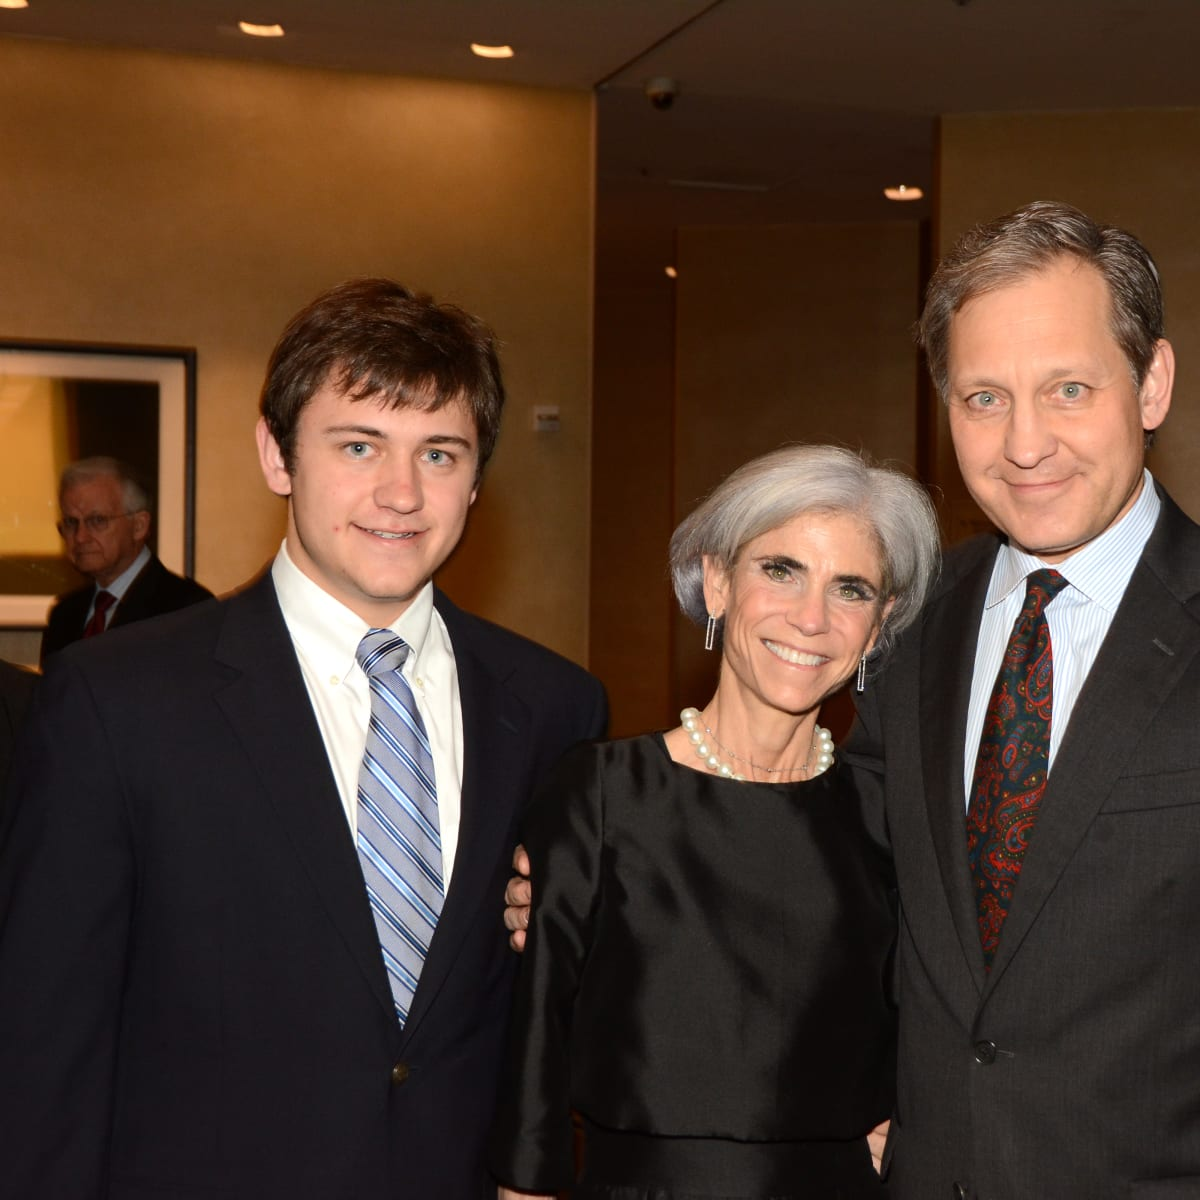 News, Houston Treasures, Dec. 2015, Jake Nyquist, Judy Nyquist, Scott Nyquist